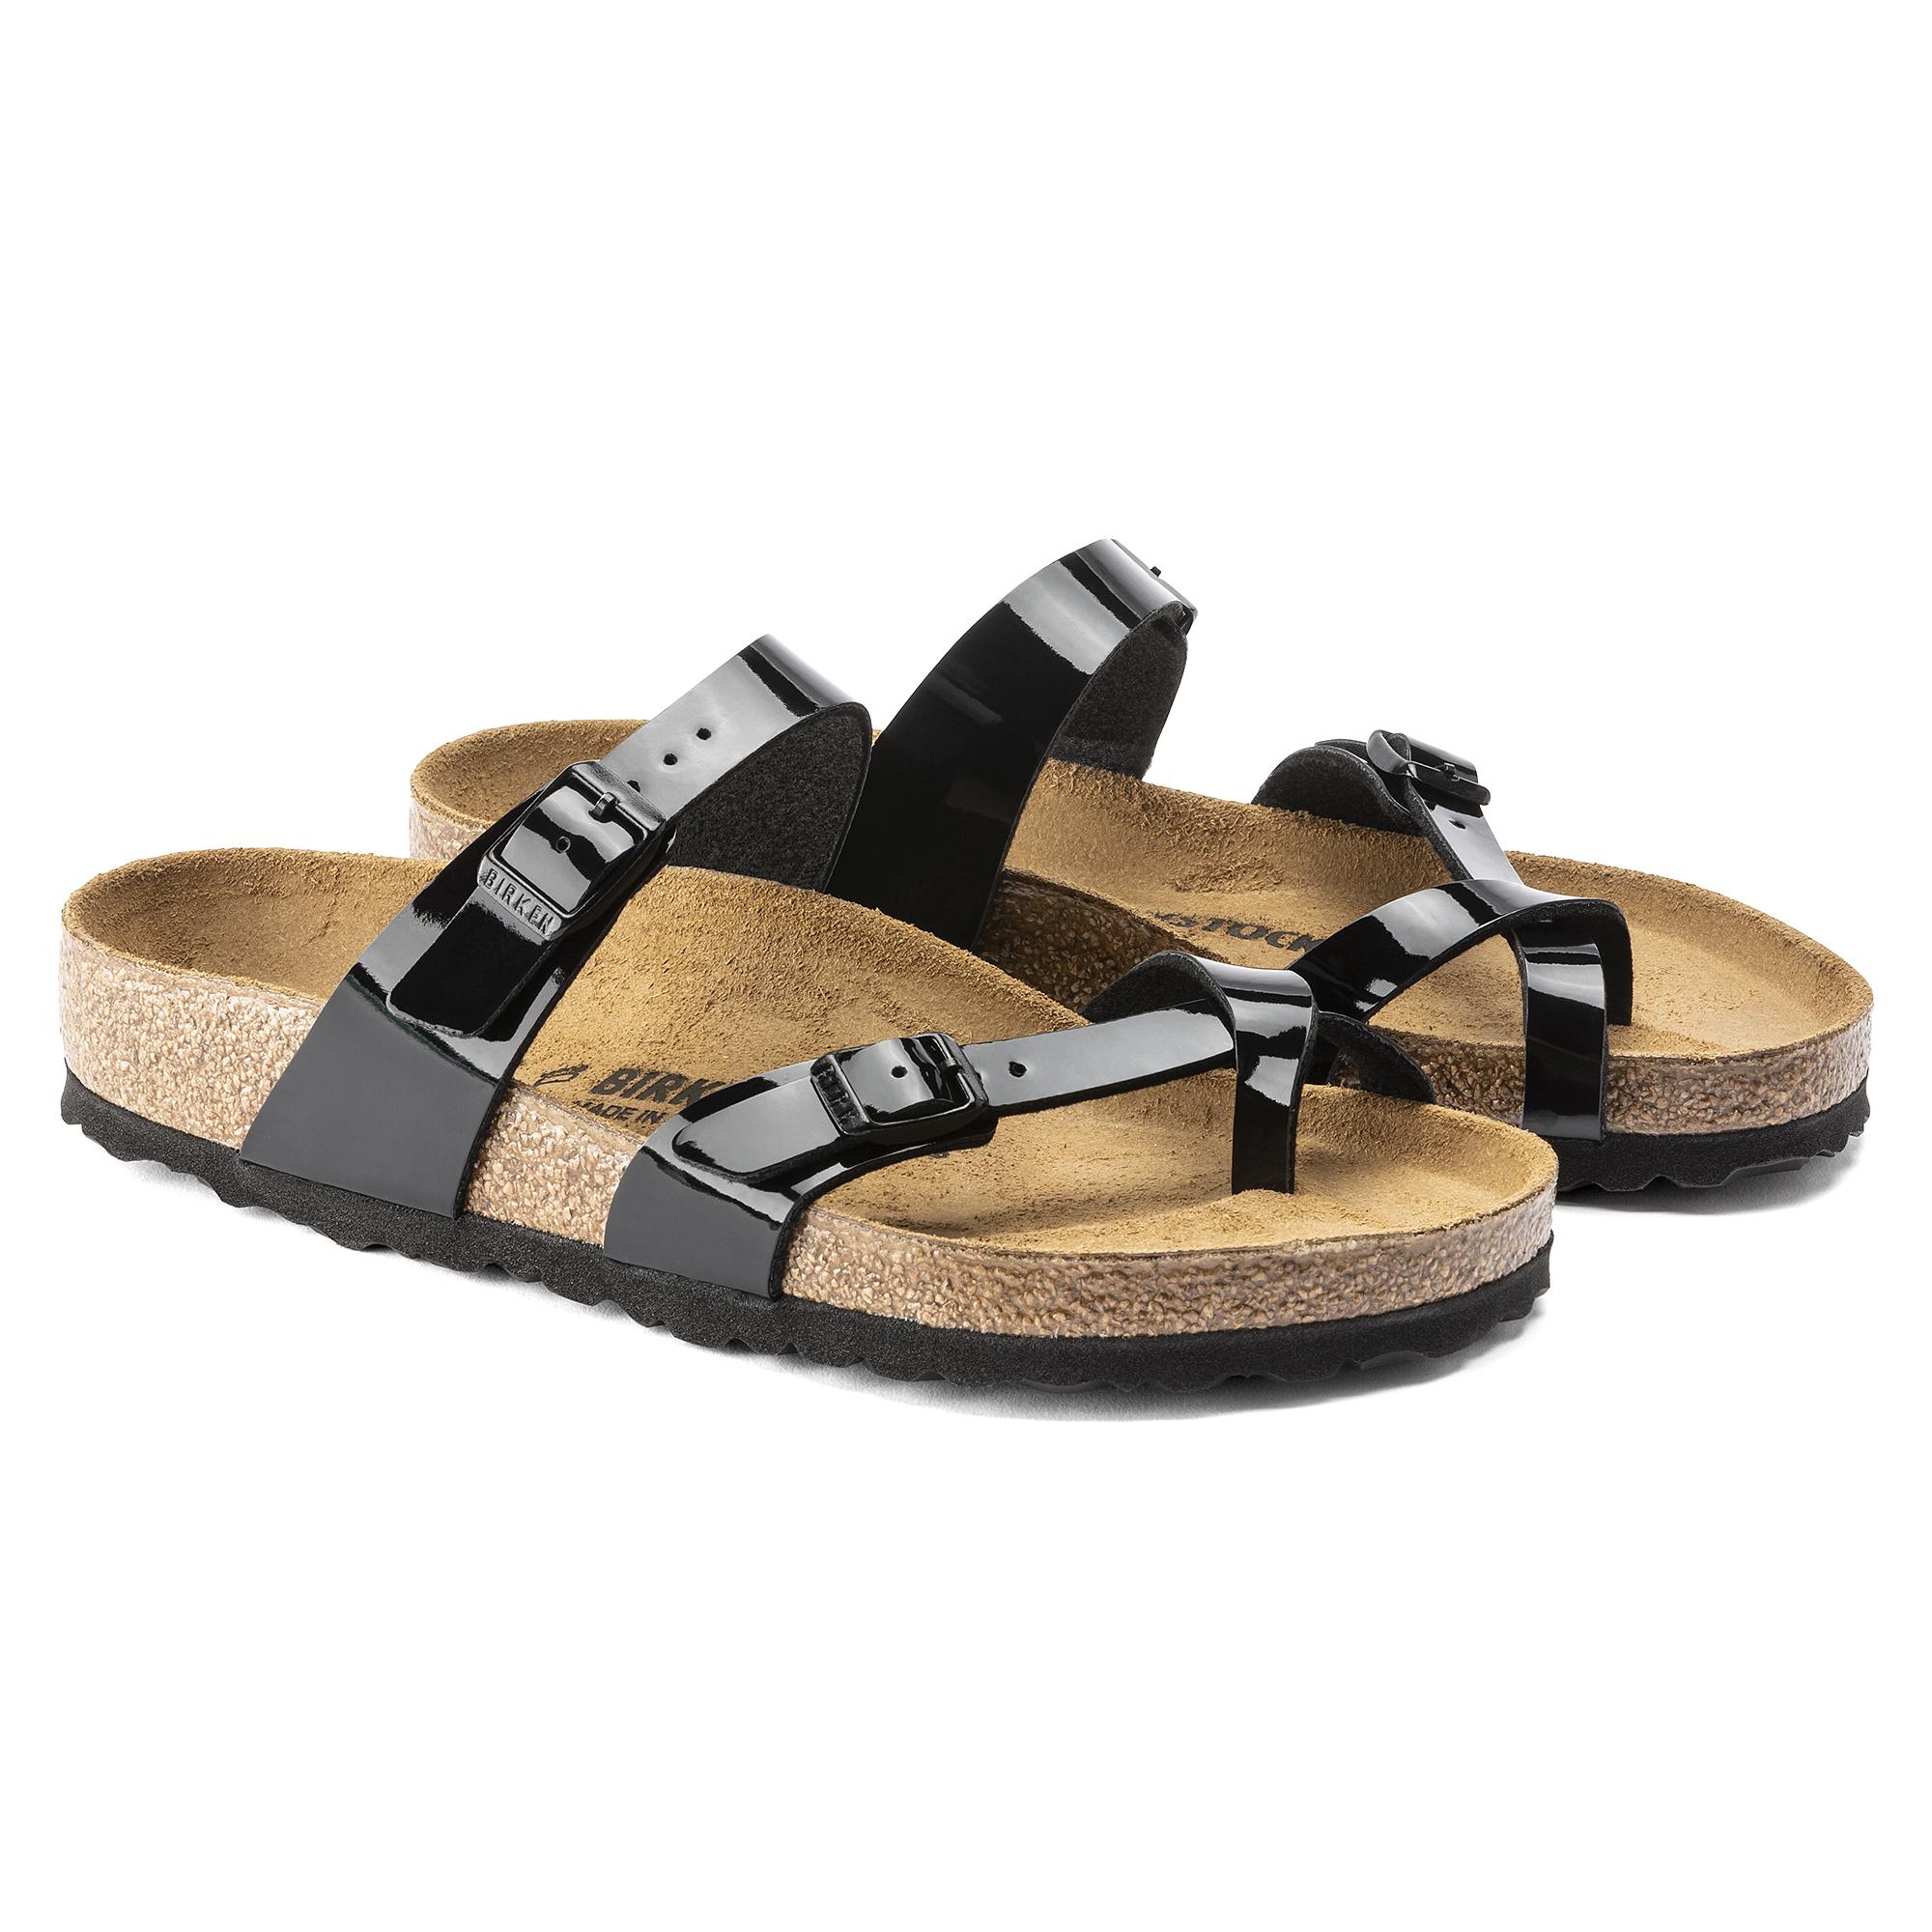 Birkenstock MAYARI - T-bar sandals - schwarz reDJu7kUJ8